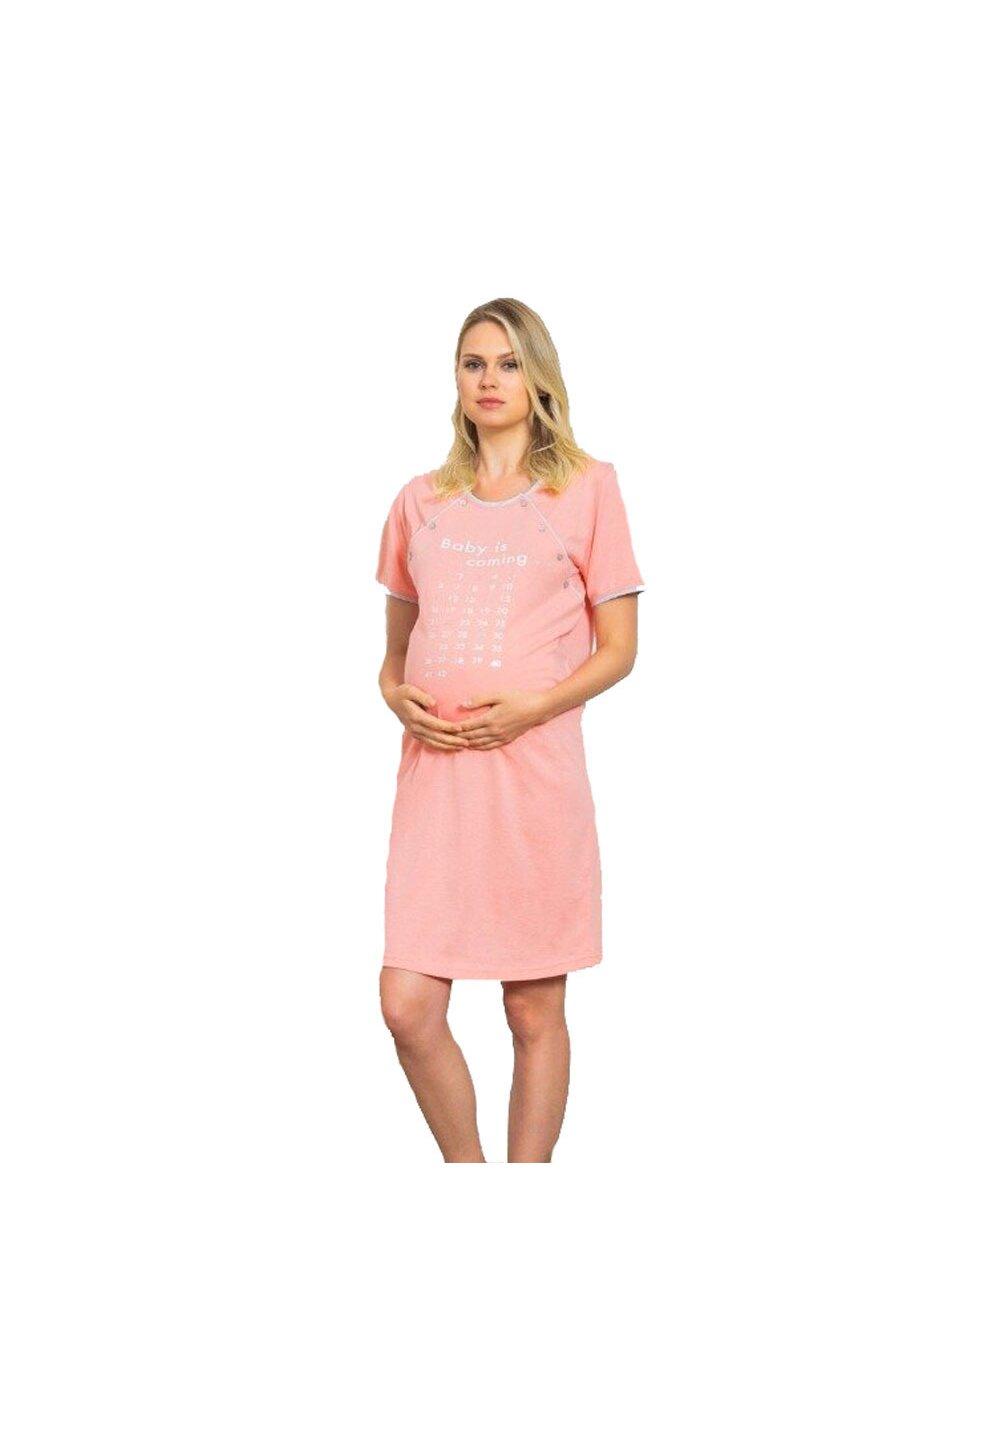 Camasa pentru alaptat, Baby is coming, roz imagine